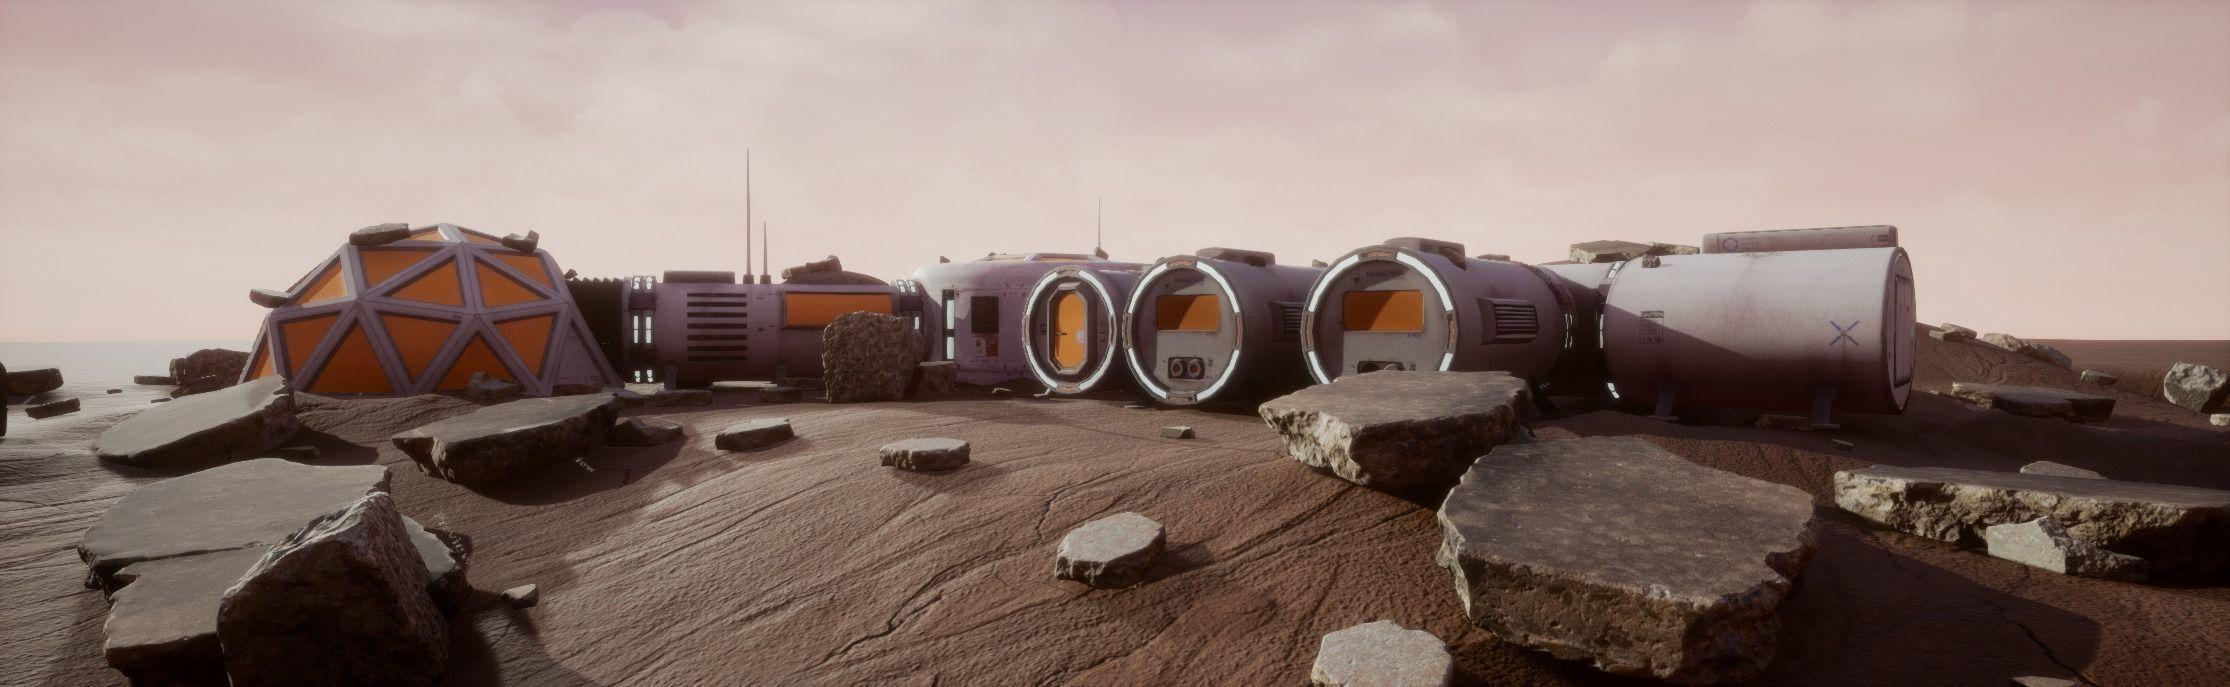 Space Mars Colony Scene 8K Textures and UnrealEngine Scene